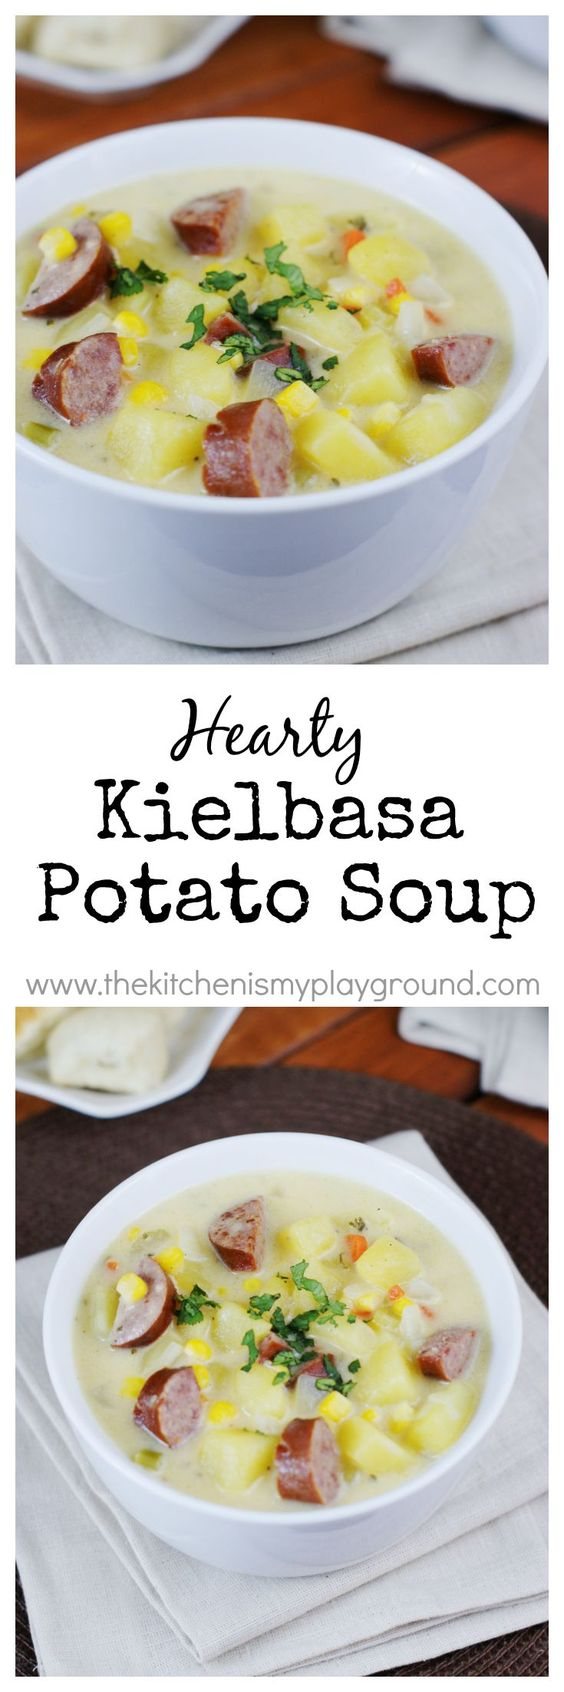 Hearty Kielbasa Potato Soup ~ loaded with flavor, creamy, comforting, & satisfying! www.thekitchenismyplayground.com